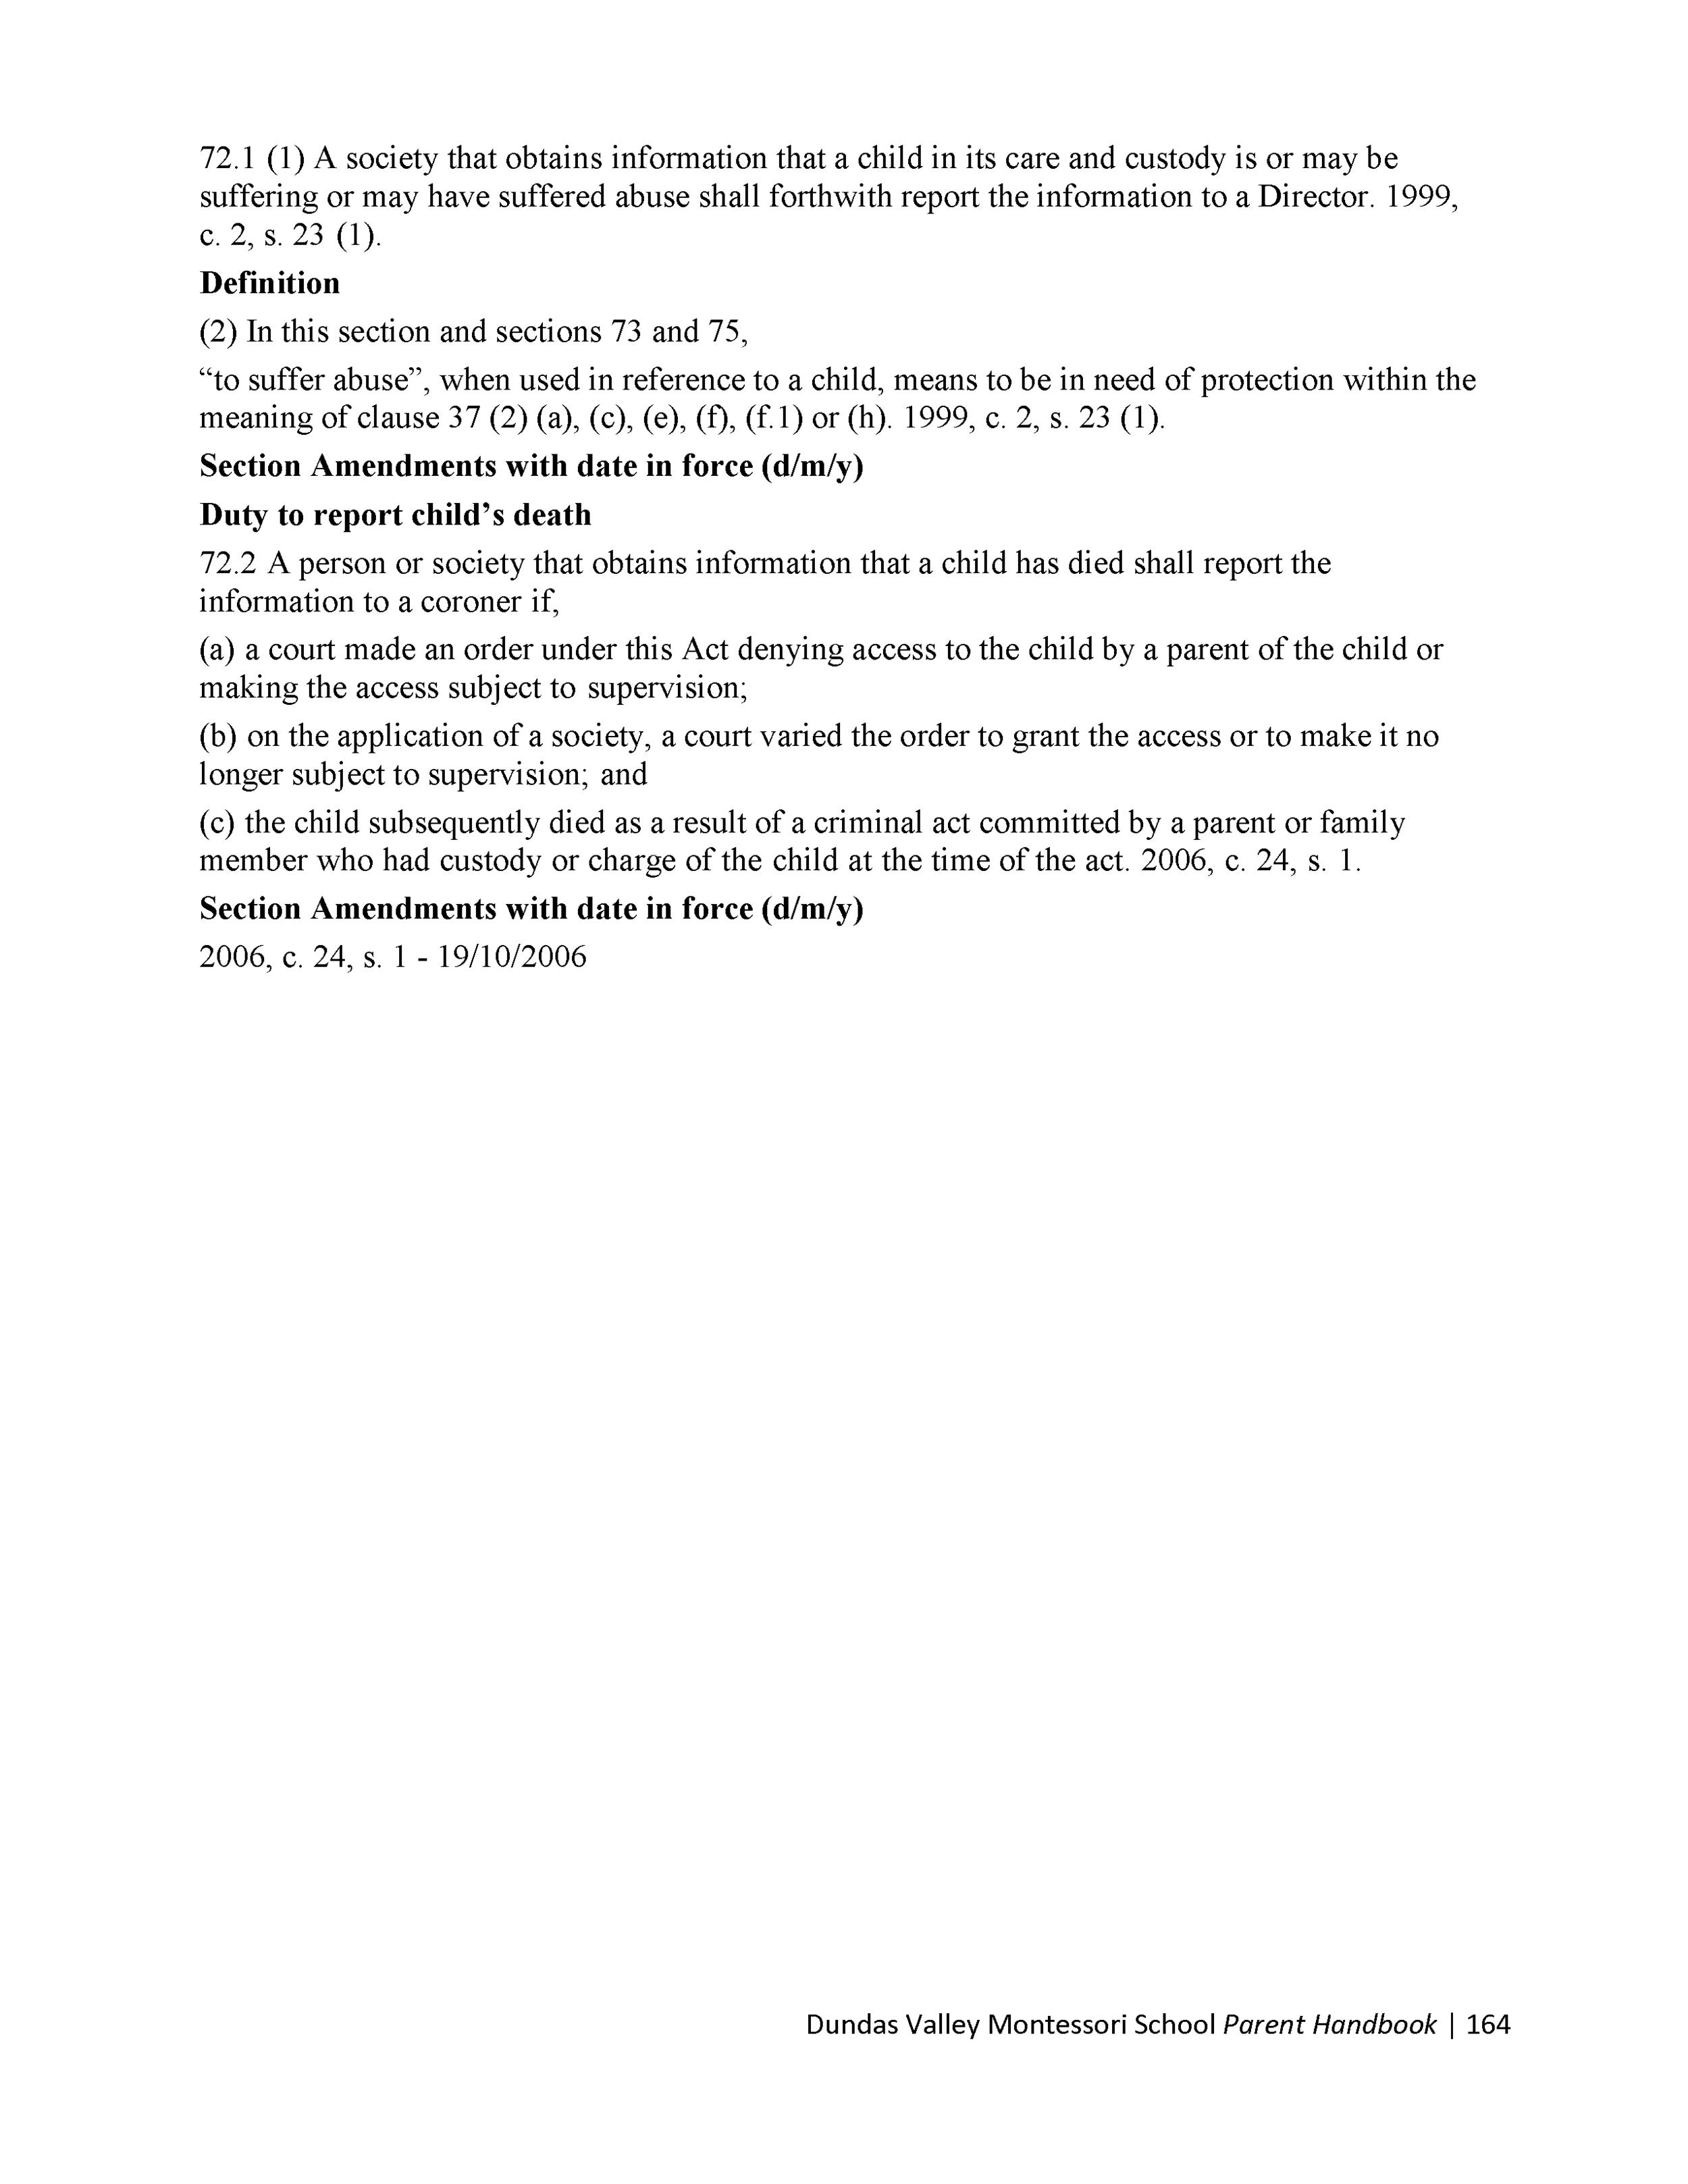 DVMS-Parent-Handbook-19-20_Page_166.png